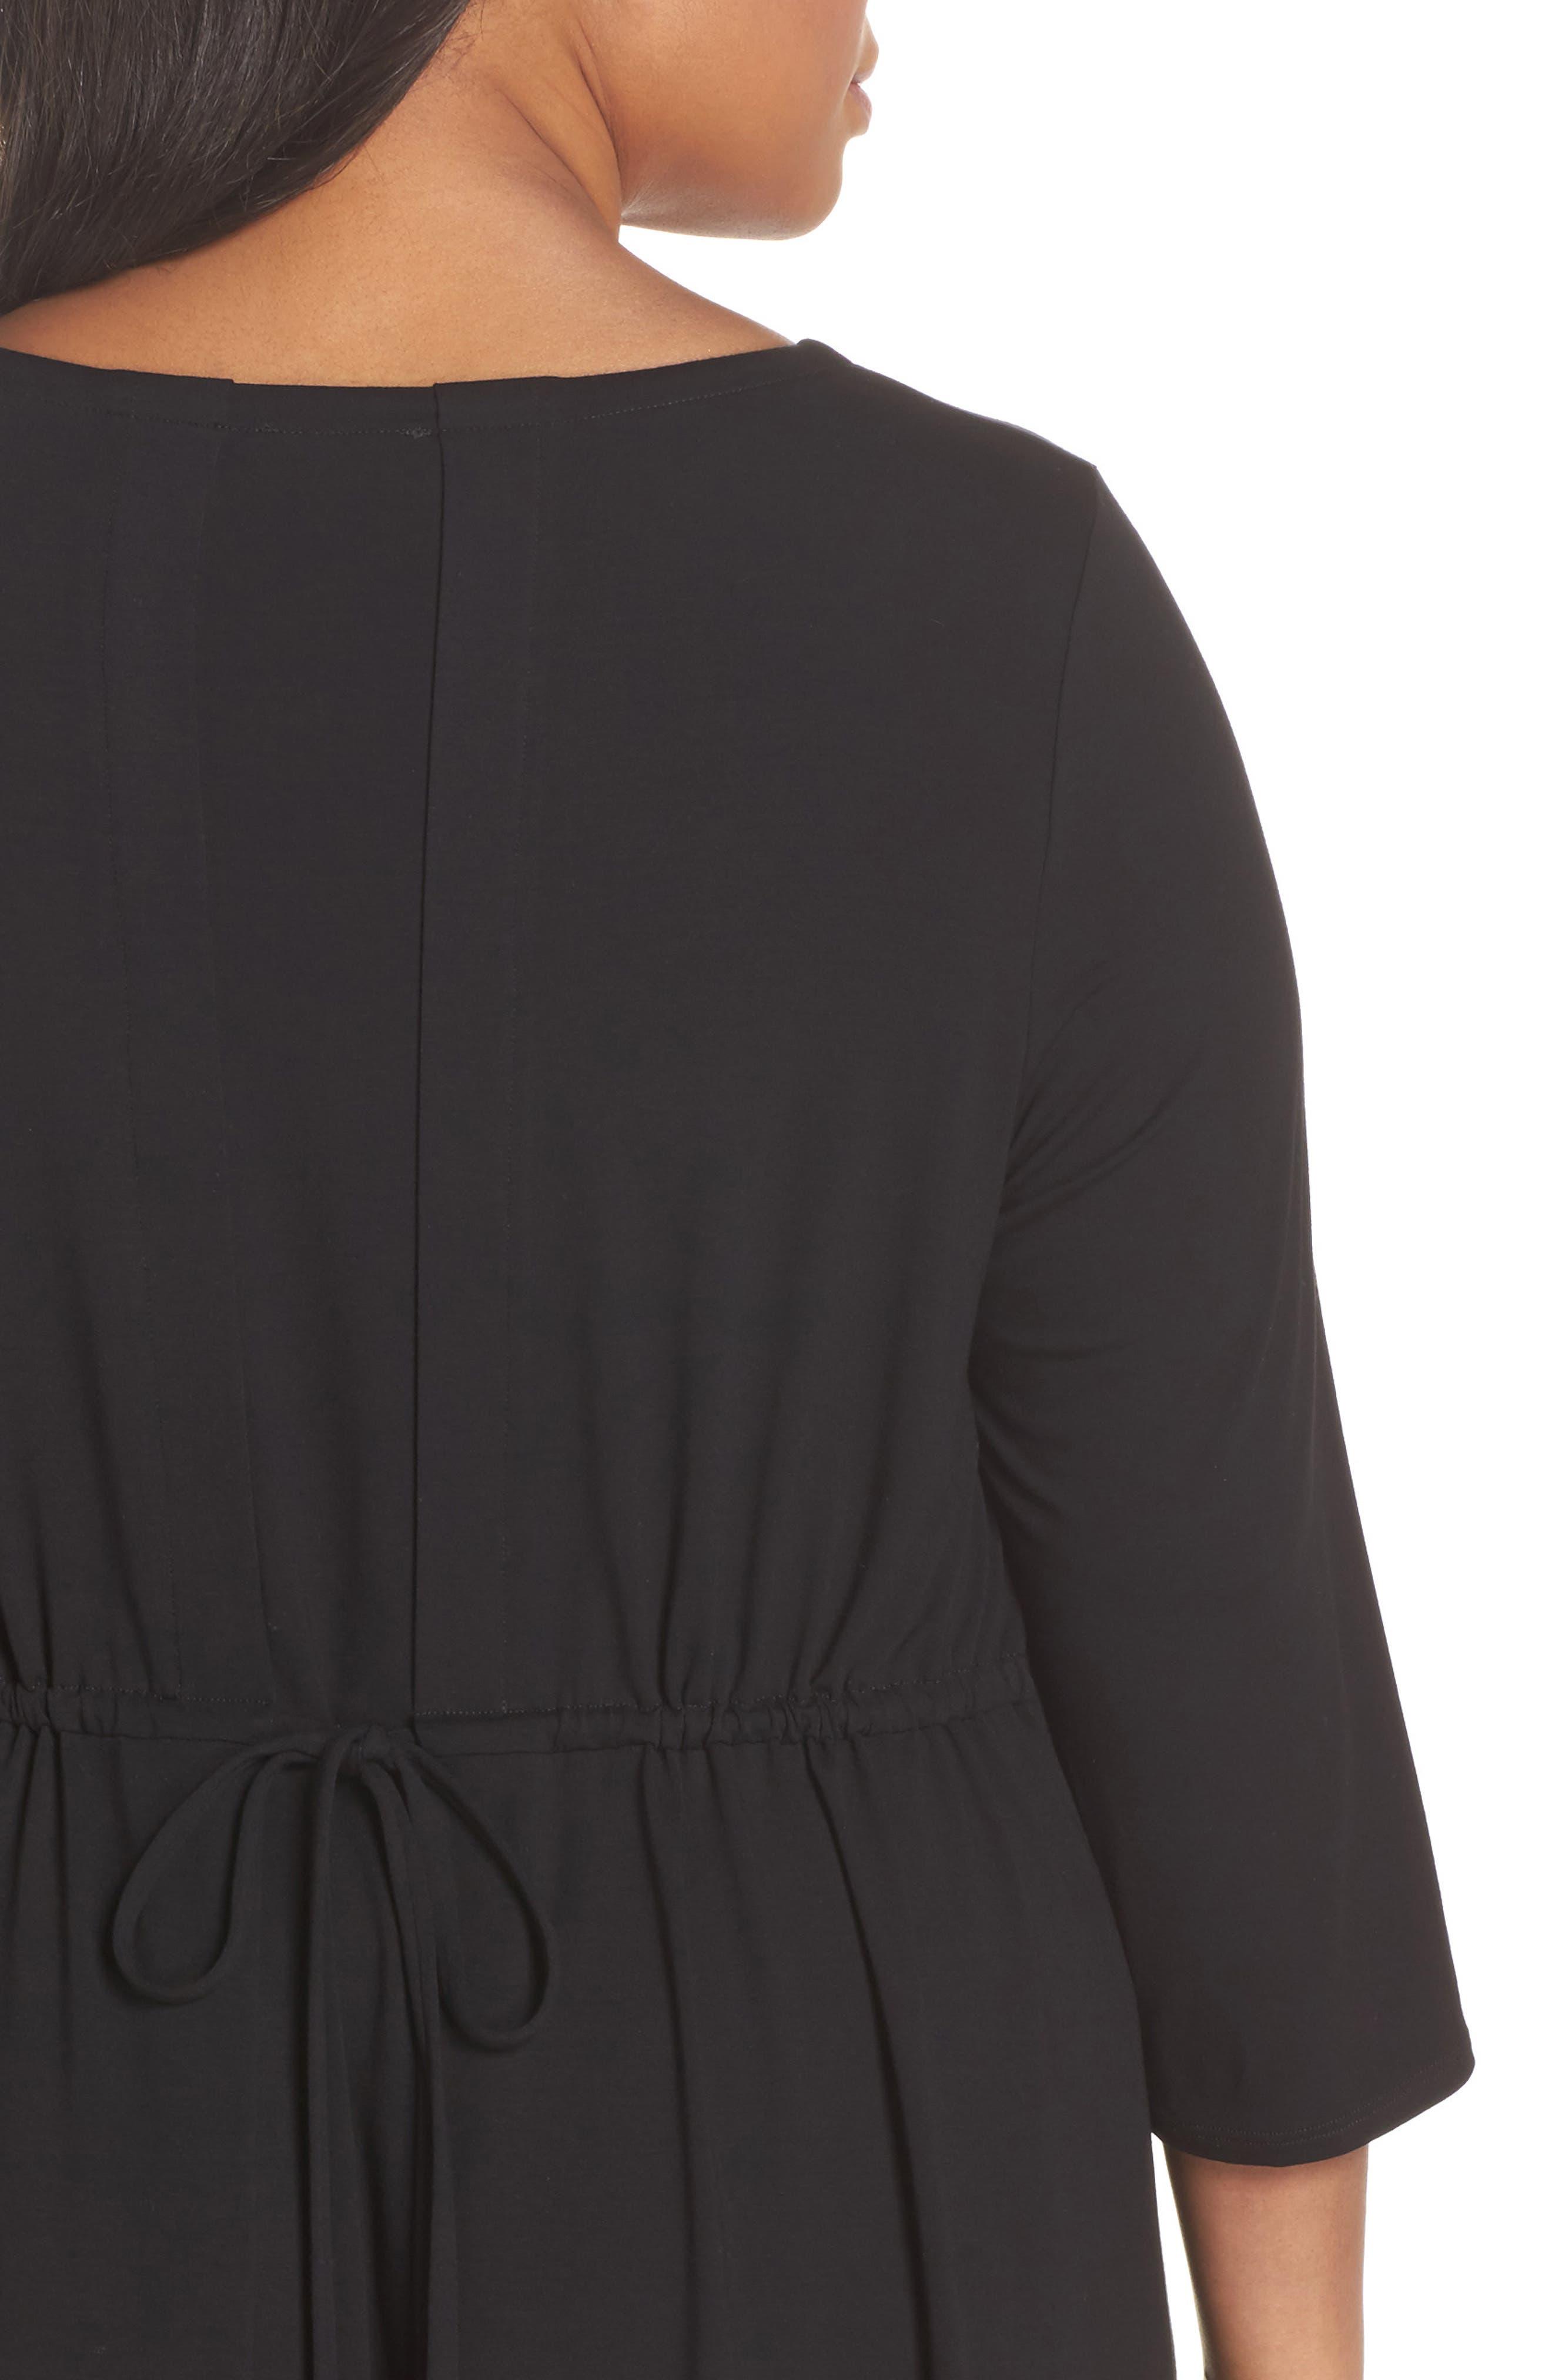 Jewel Neck Tie Back Dress,                             Alternate thumbnail 16, color,